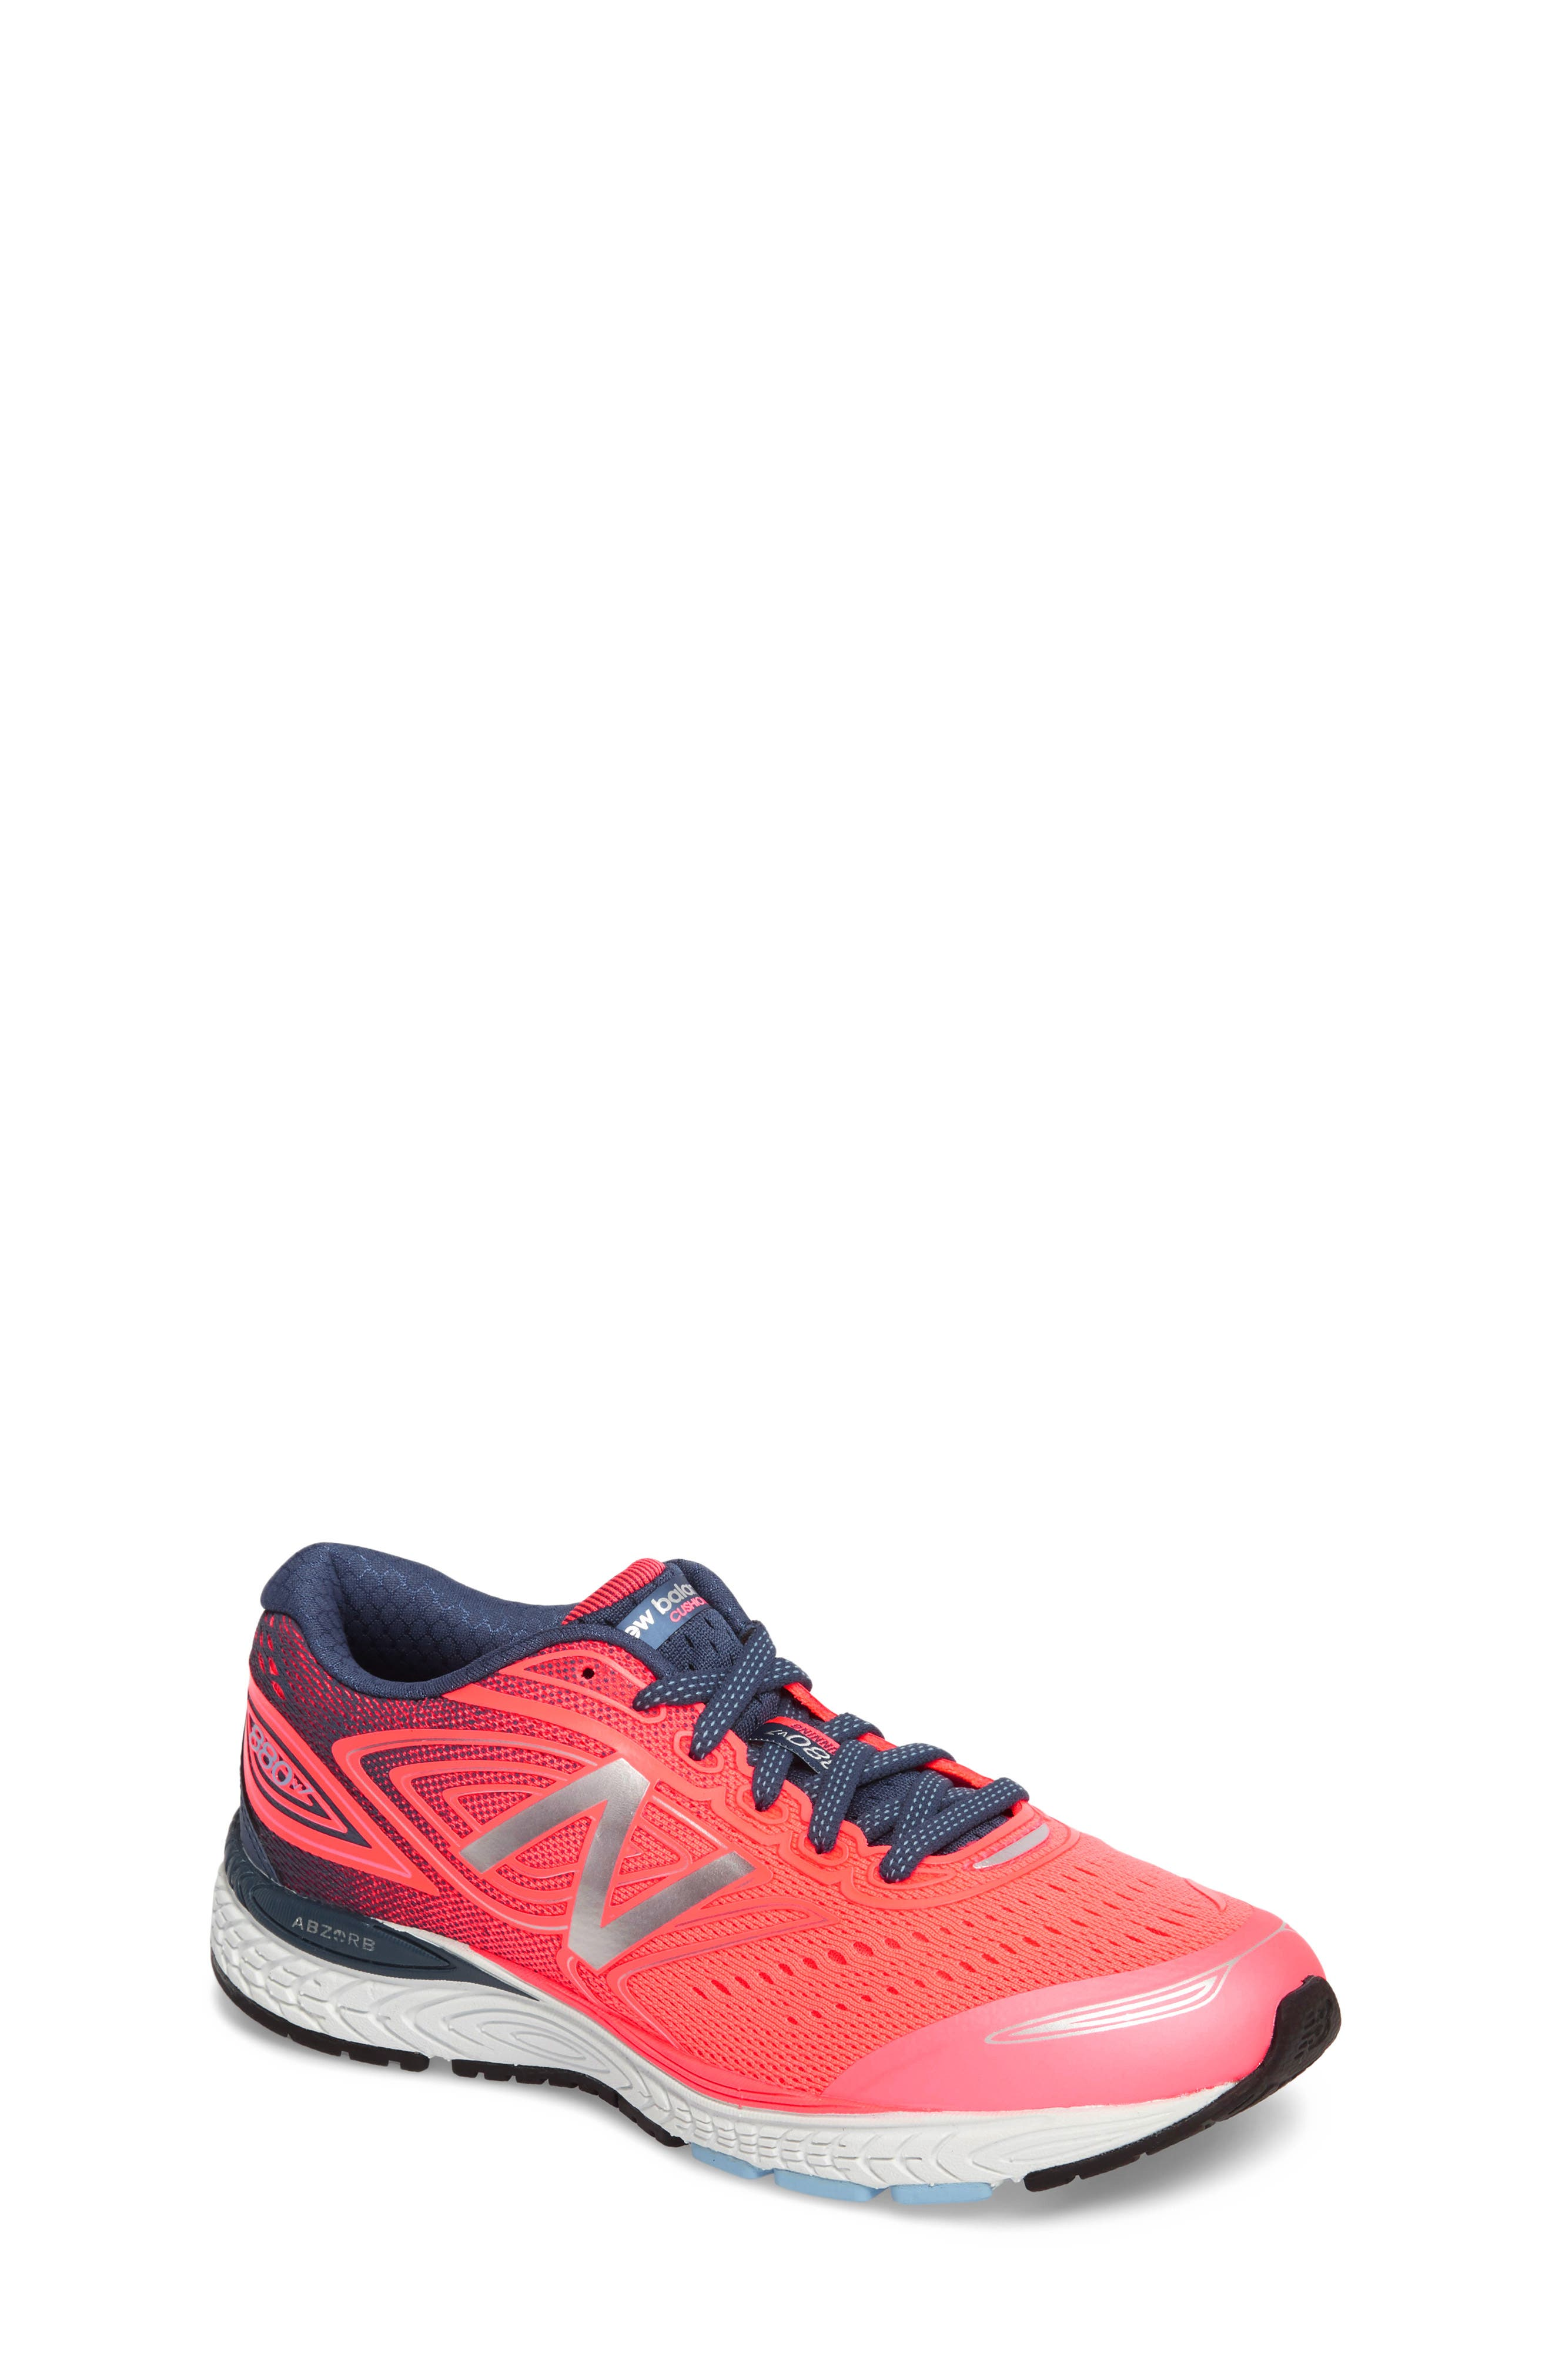 880v7 Sneaker,                             Main thumbnail 1, color,                             GUAVA